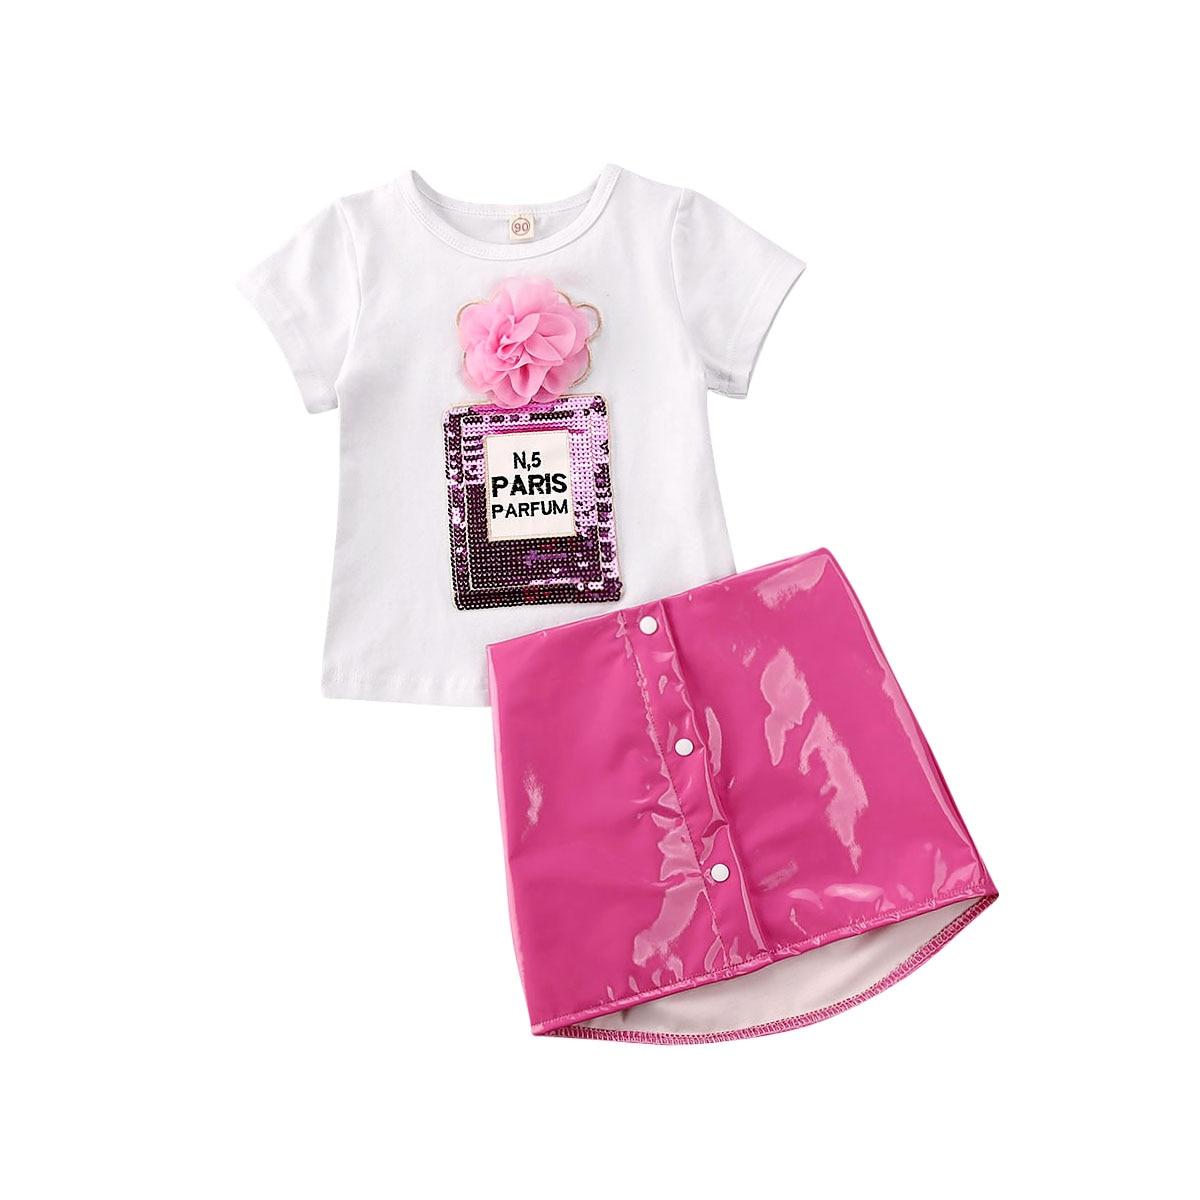 2pcs Toddler Kid Baby Girl T-shirt Tops Fringe Tassel Skirt Dress Clothes Outfit